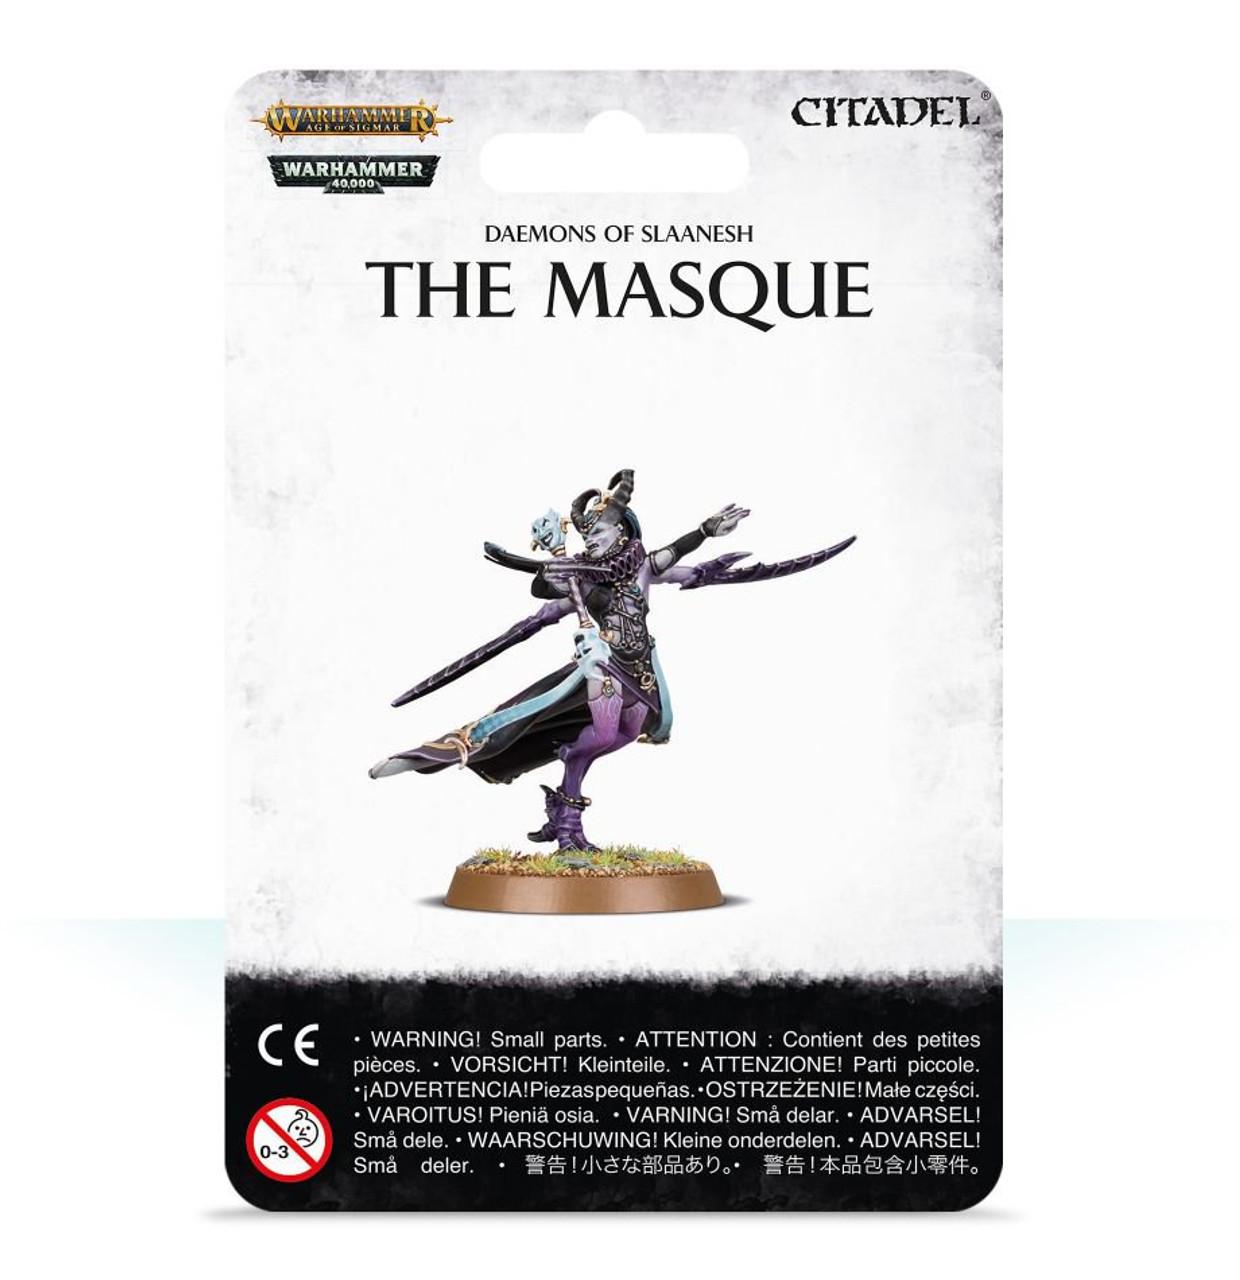 Warhammer Age of Sigmar: Daemons of Slaanesh - The Masque